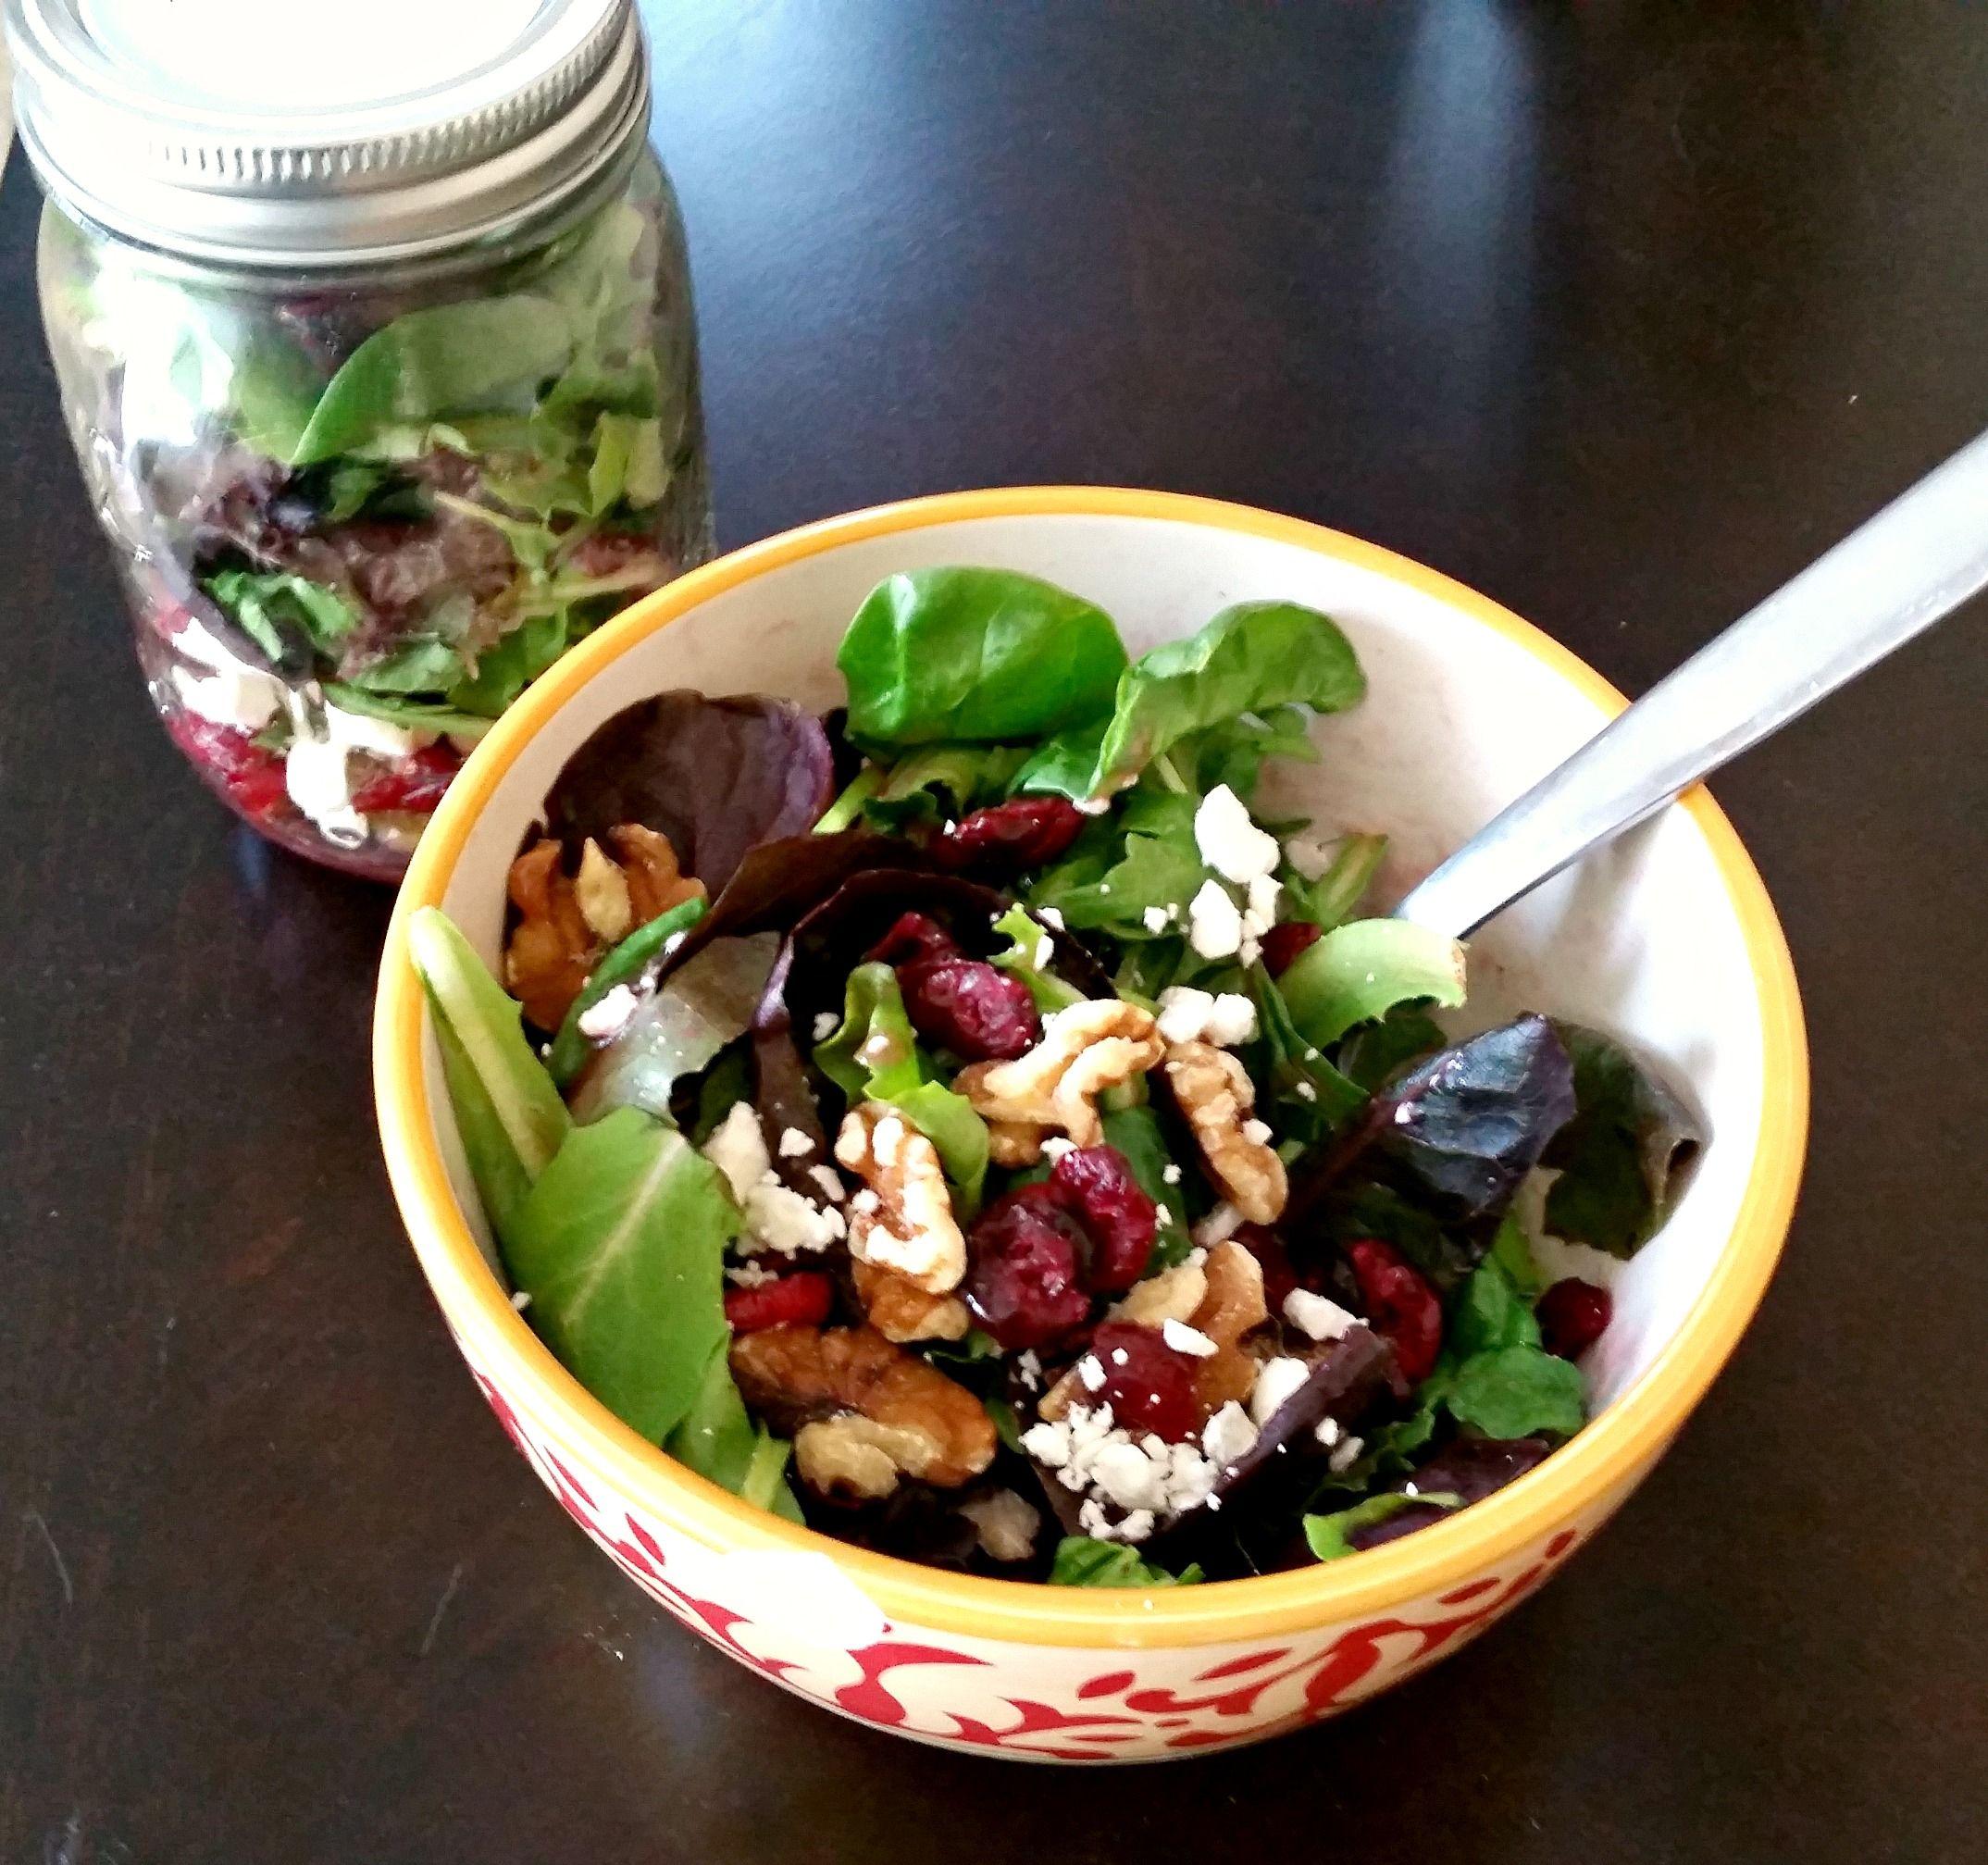 Salad in a Jar! Cranberry, Feta & Walnut Salad with Raspberry Vinaigrette